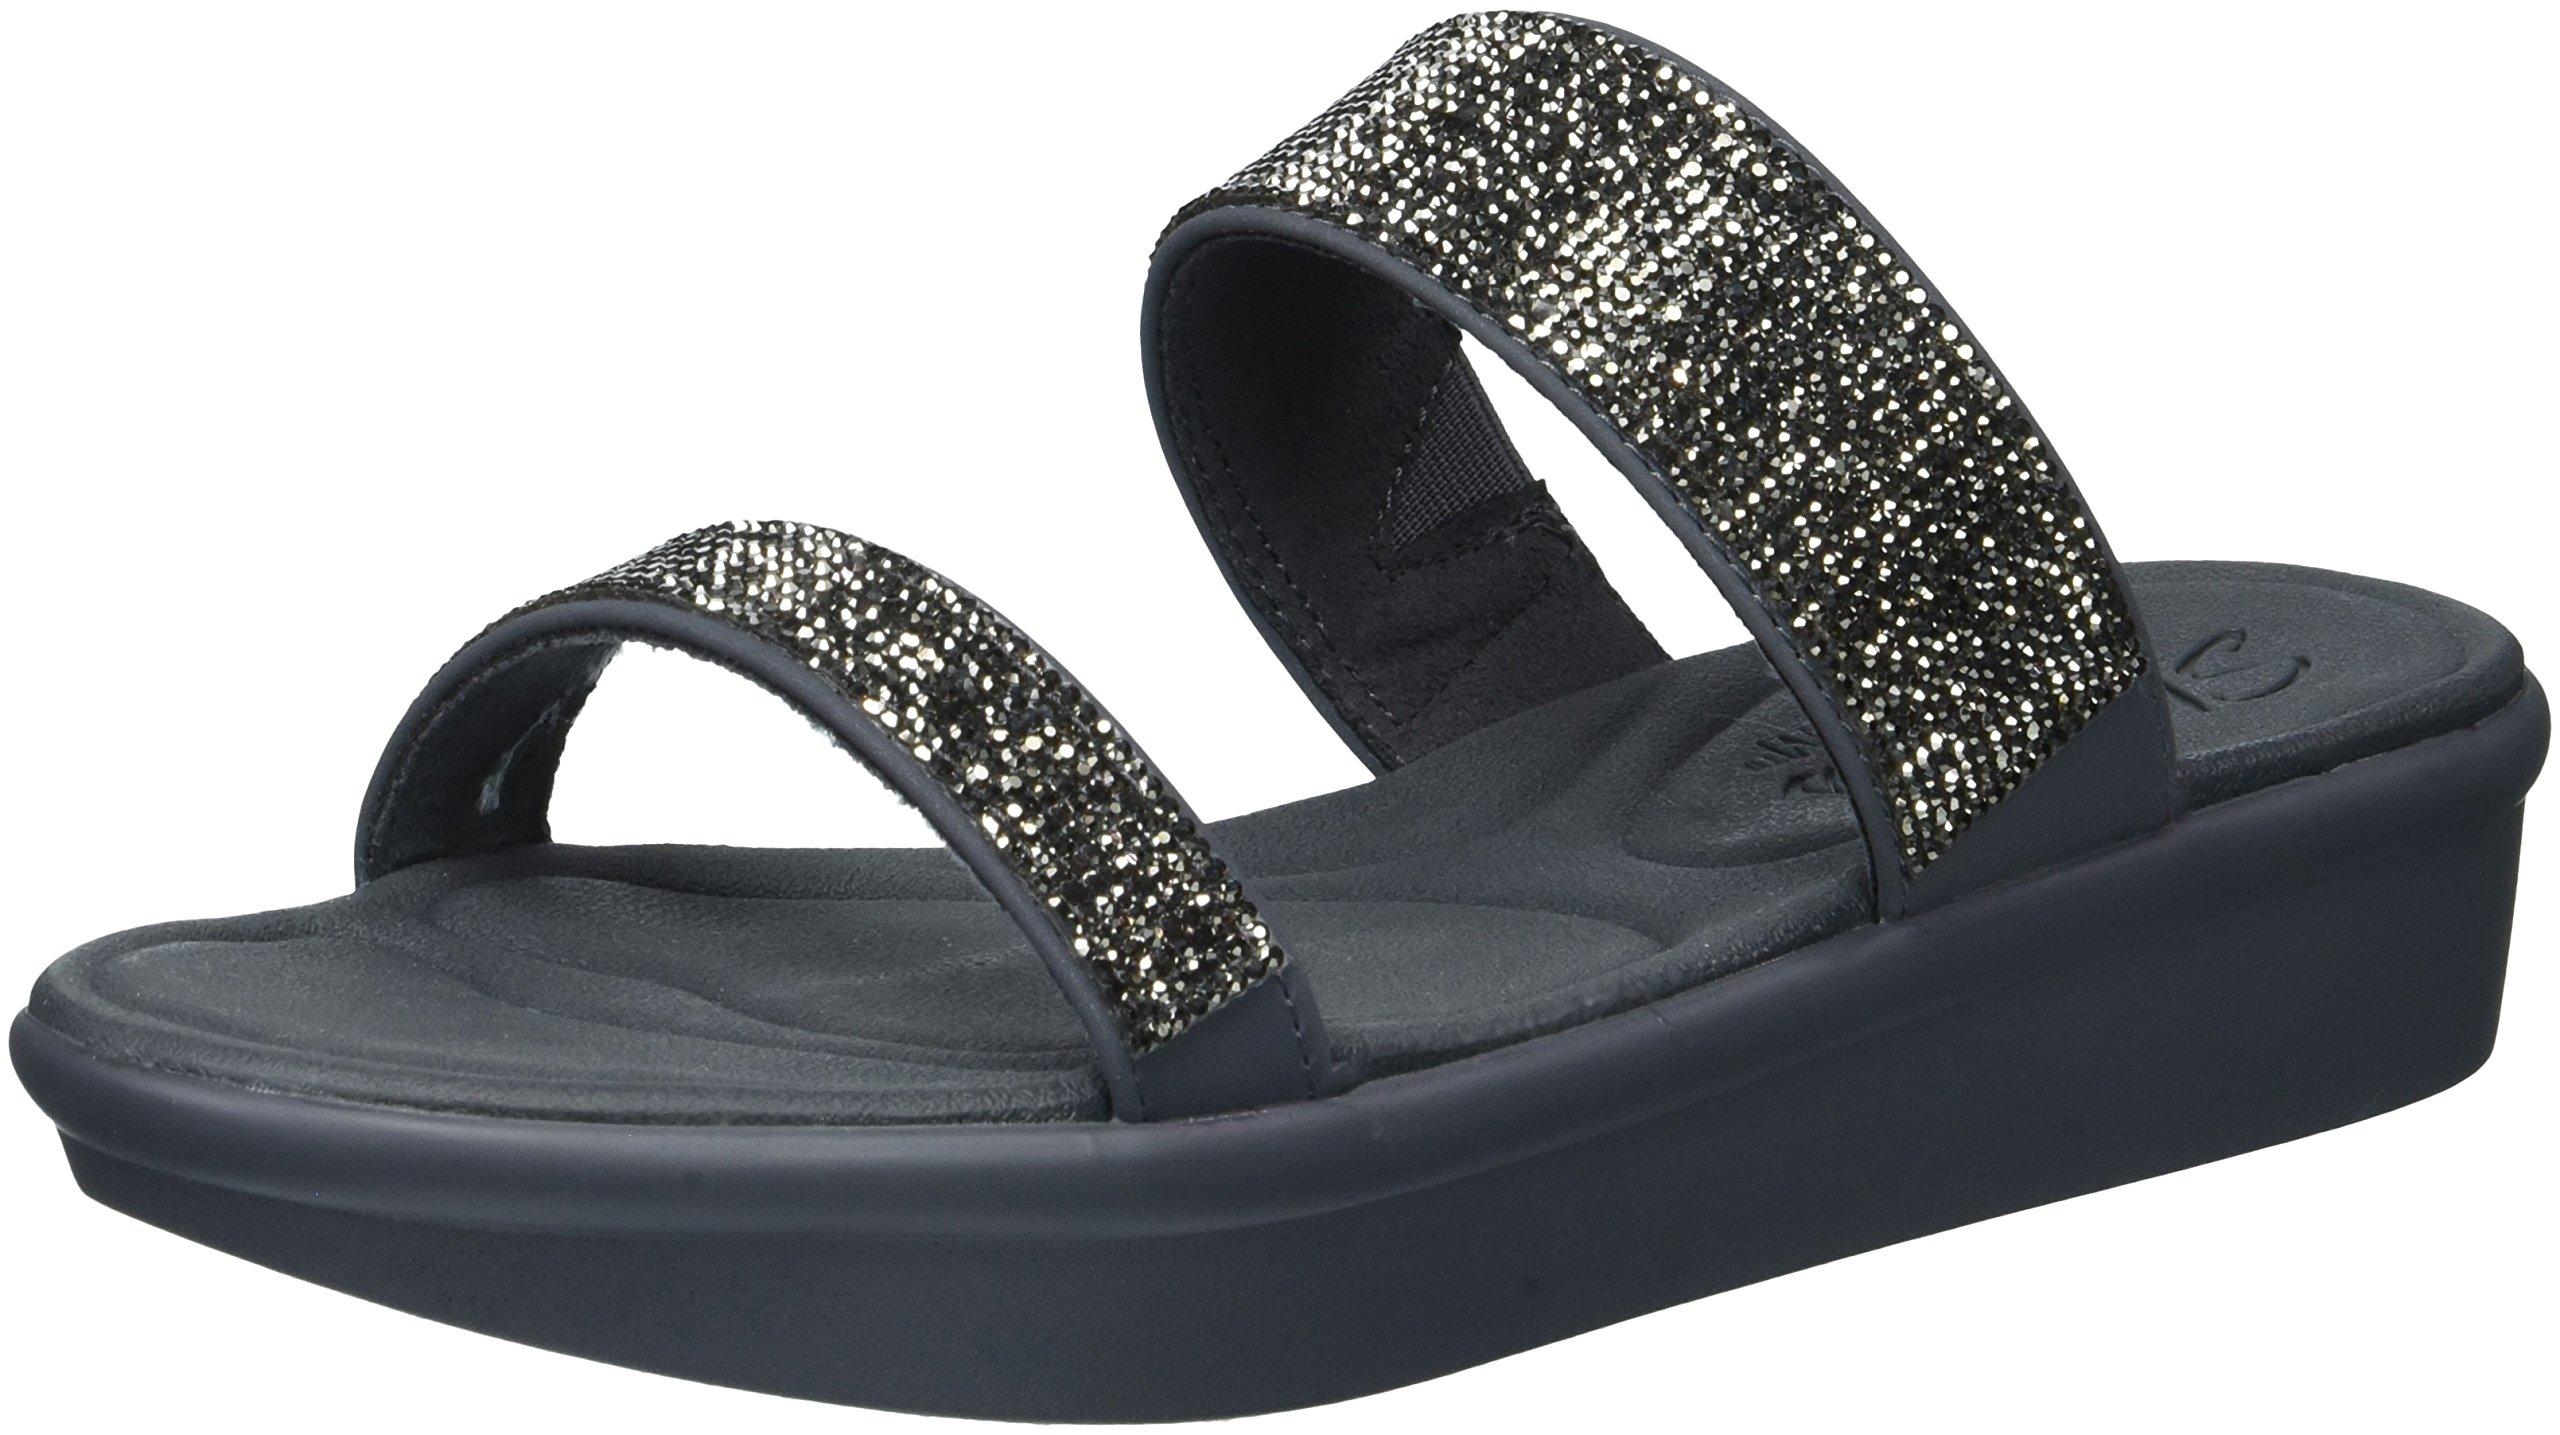 Skechers Cali Women's Bumblers-Bright Start Slide Sandal,Charcoal,8 M US